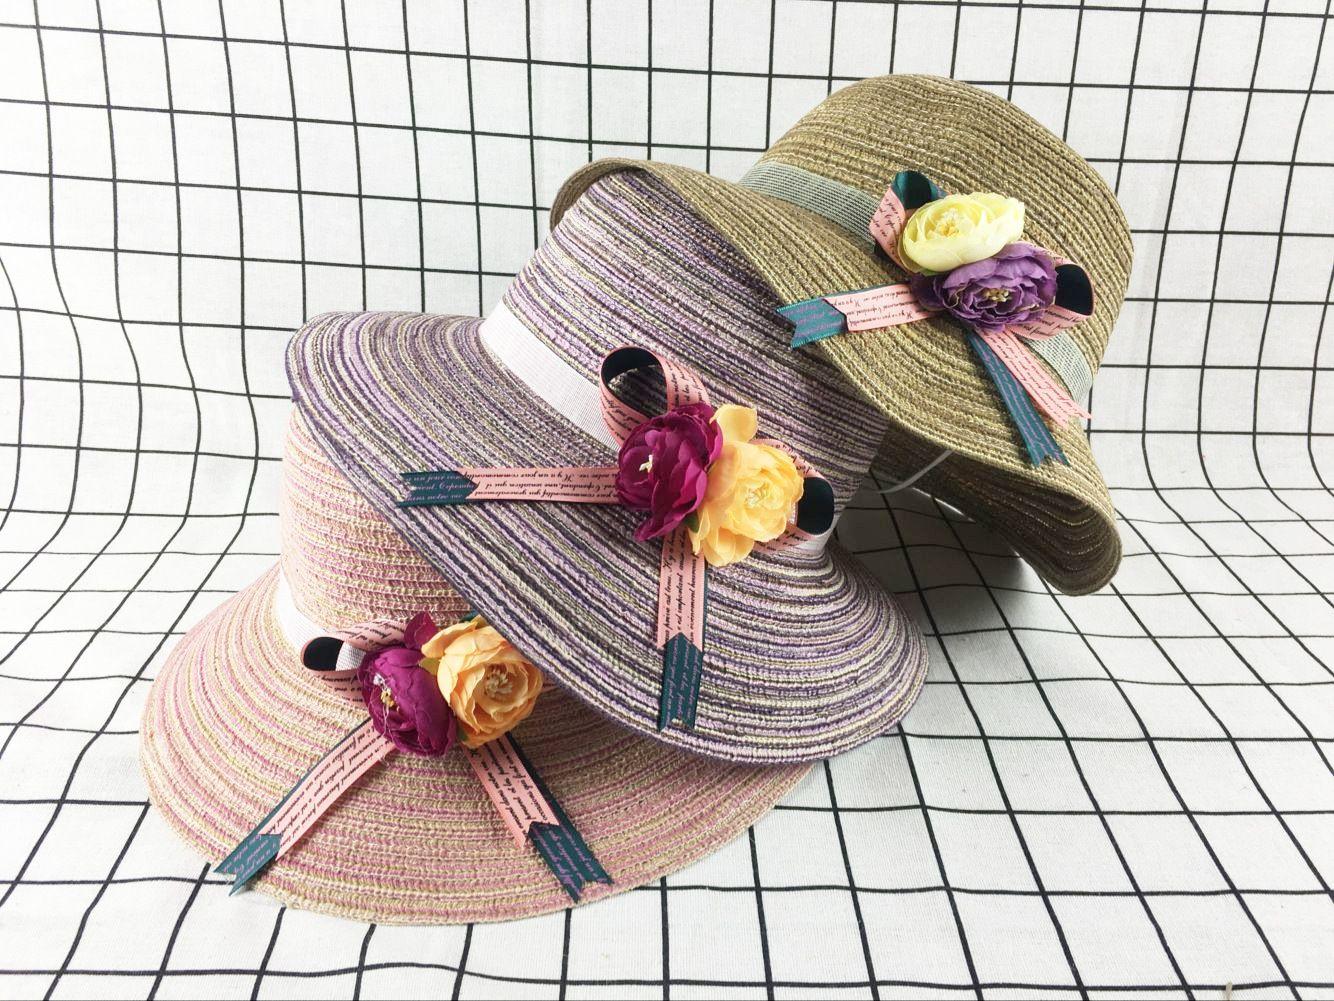 559ef731898 Korean Cute Sun Visor Bow Beach Women s Straw Hat Folding Comfortable  Travel Small Eaves Straw Hat Lovely Beach Hat Affordable Little Eaves Hat  Travel ...